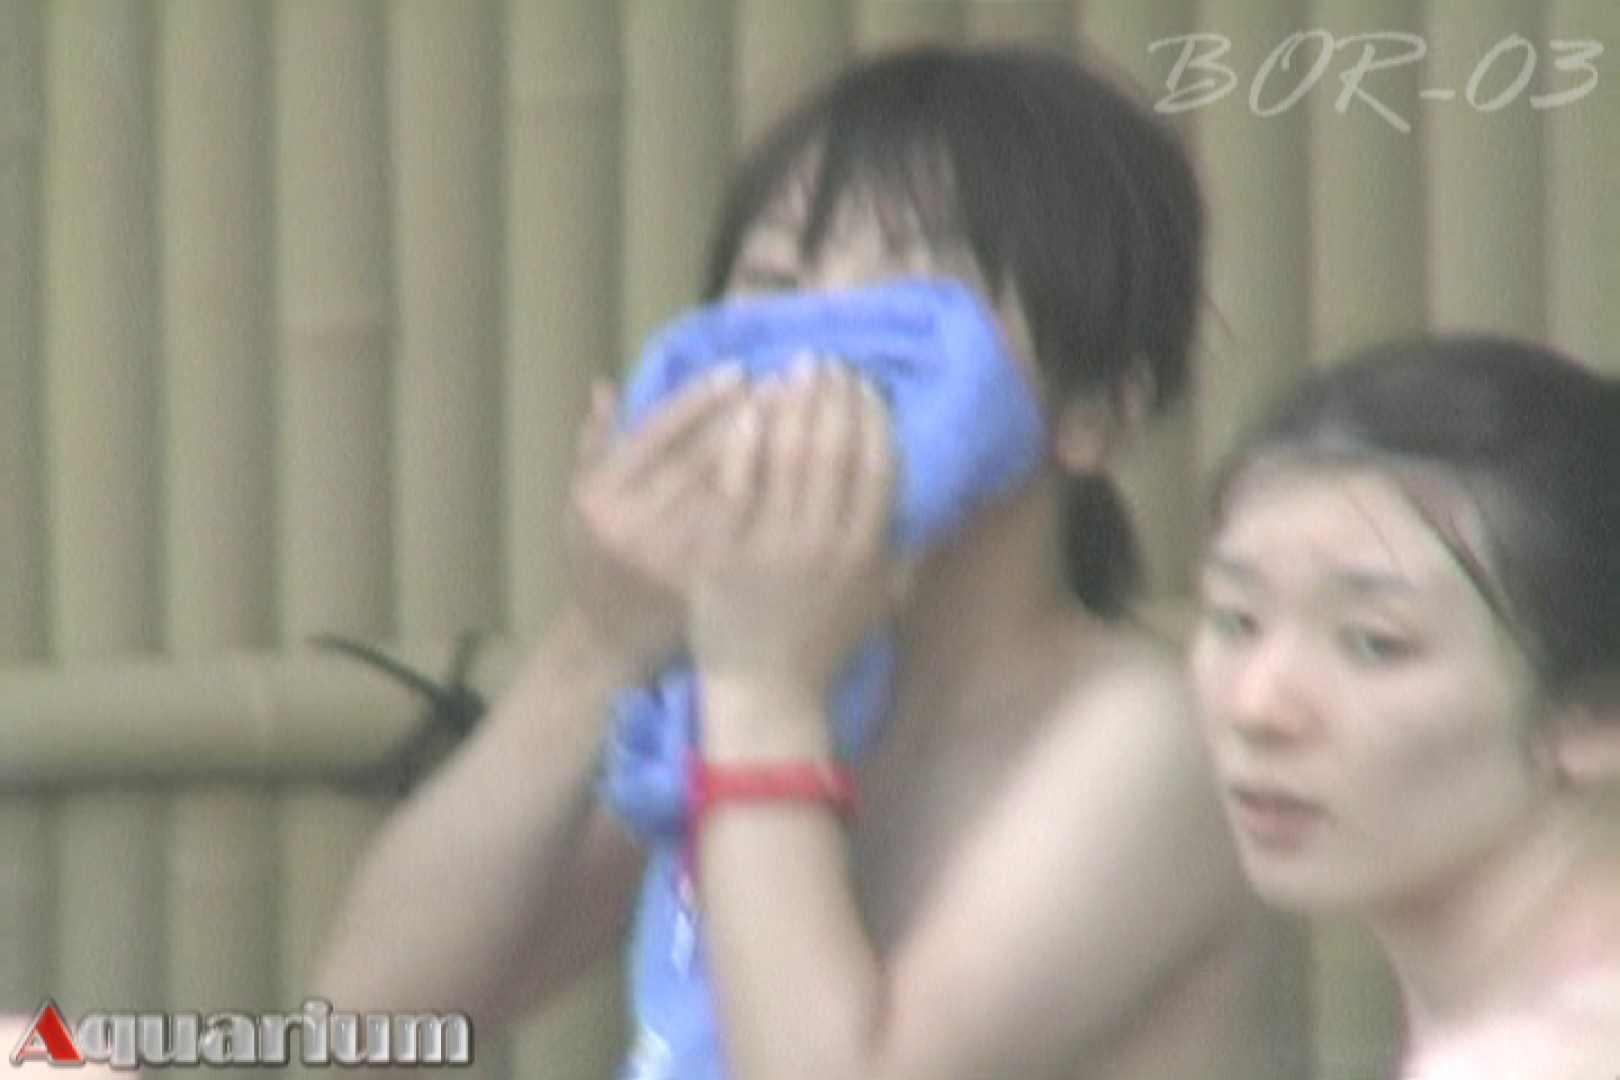 Aquaな露天風呂Vol.489 人気シリーズ おまんこ無修正動画無料 100PIX 78